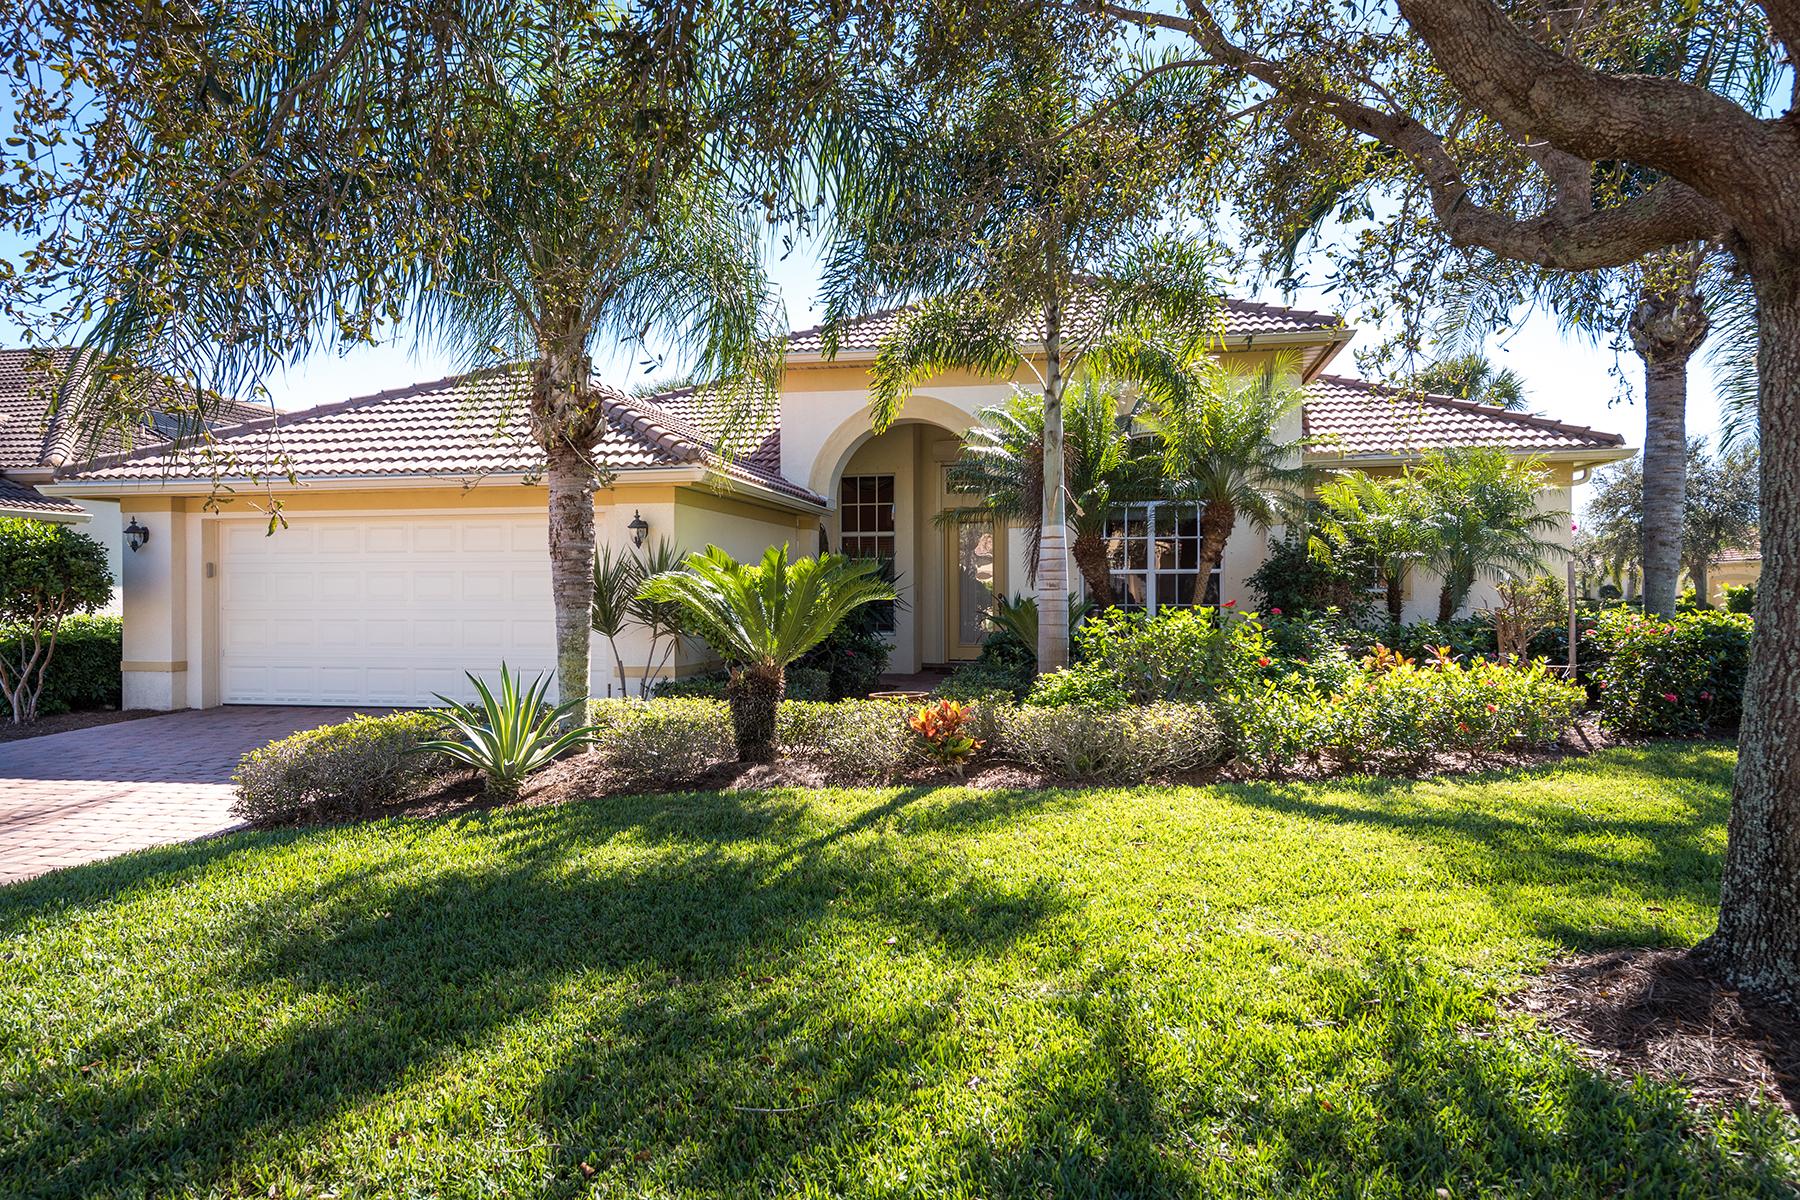 Single Family Homes のために 売買 アット COCO BAY - WINDWARD POINTE 16127 Sand Ridge Court, Fort Myers, フロリダ 33908 アメリカ